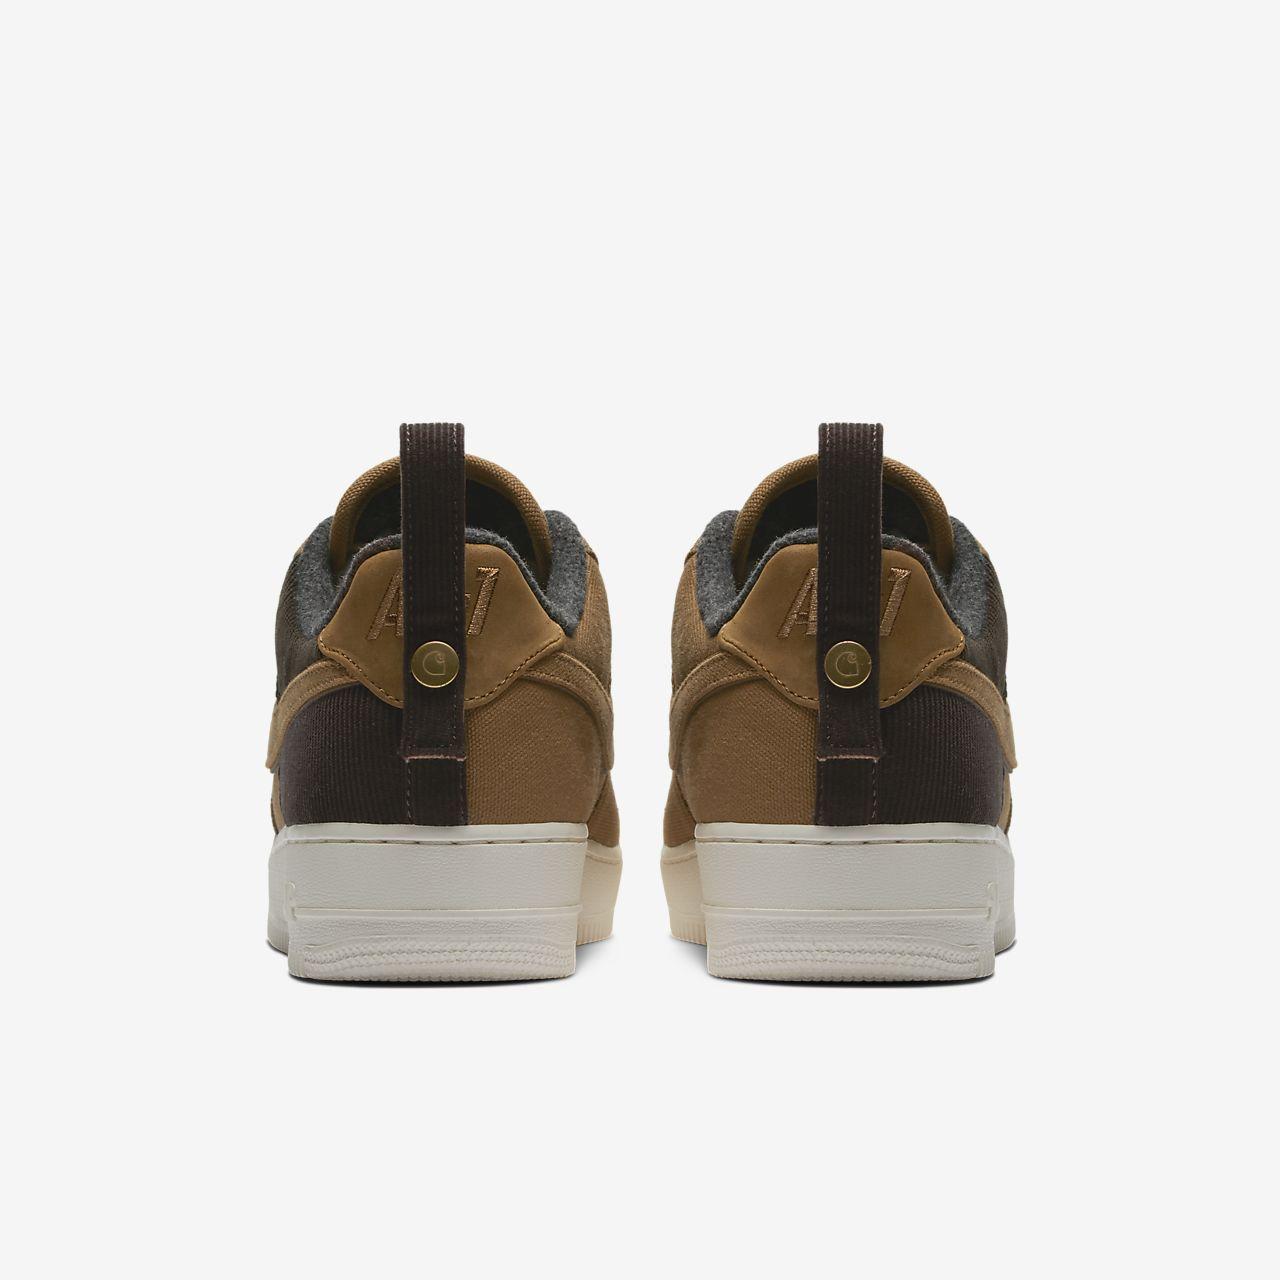 promo code e2c0d ebc25 ... Nike x Carhartt WIP Air Force 1 Men s Shoe